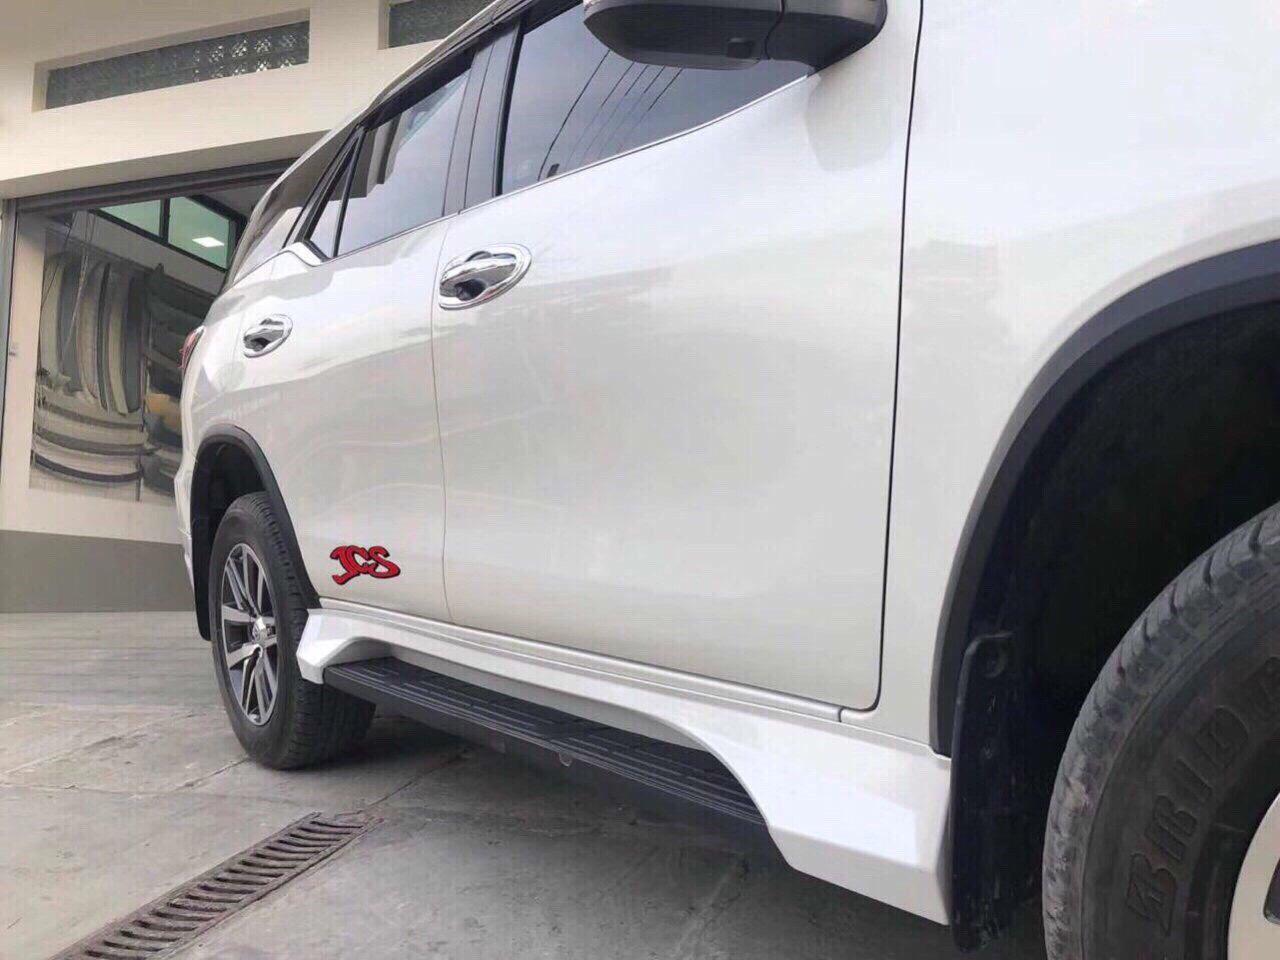 Bodykit cho xe Fortuner 2019